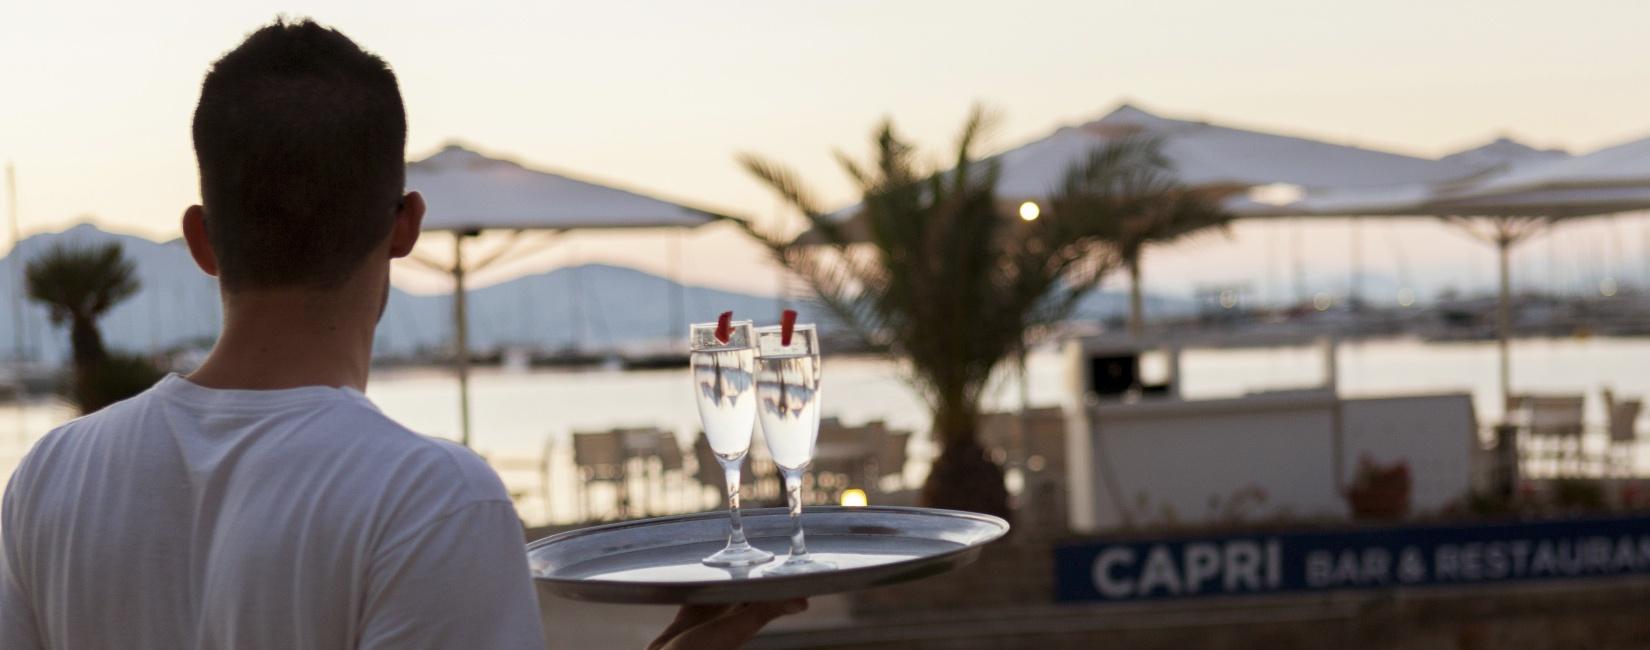 pollensa Capri Hotel